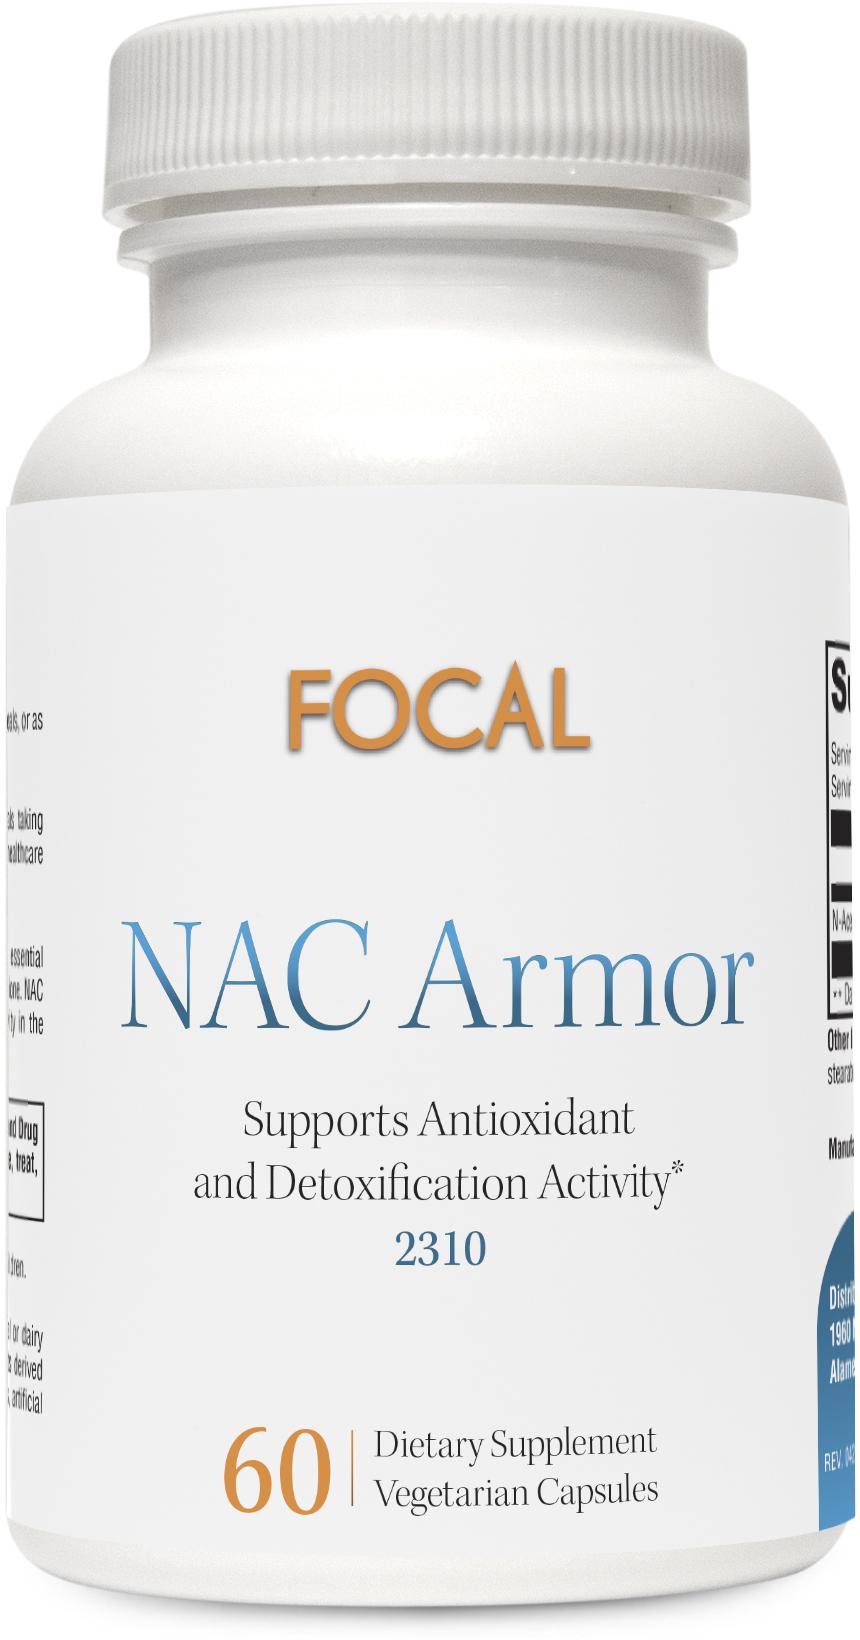 NAC Armor